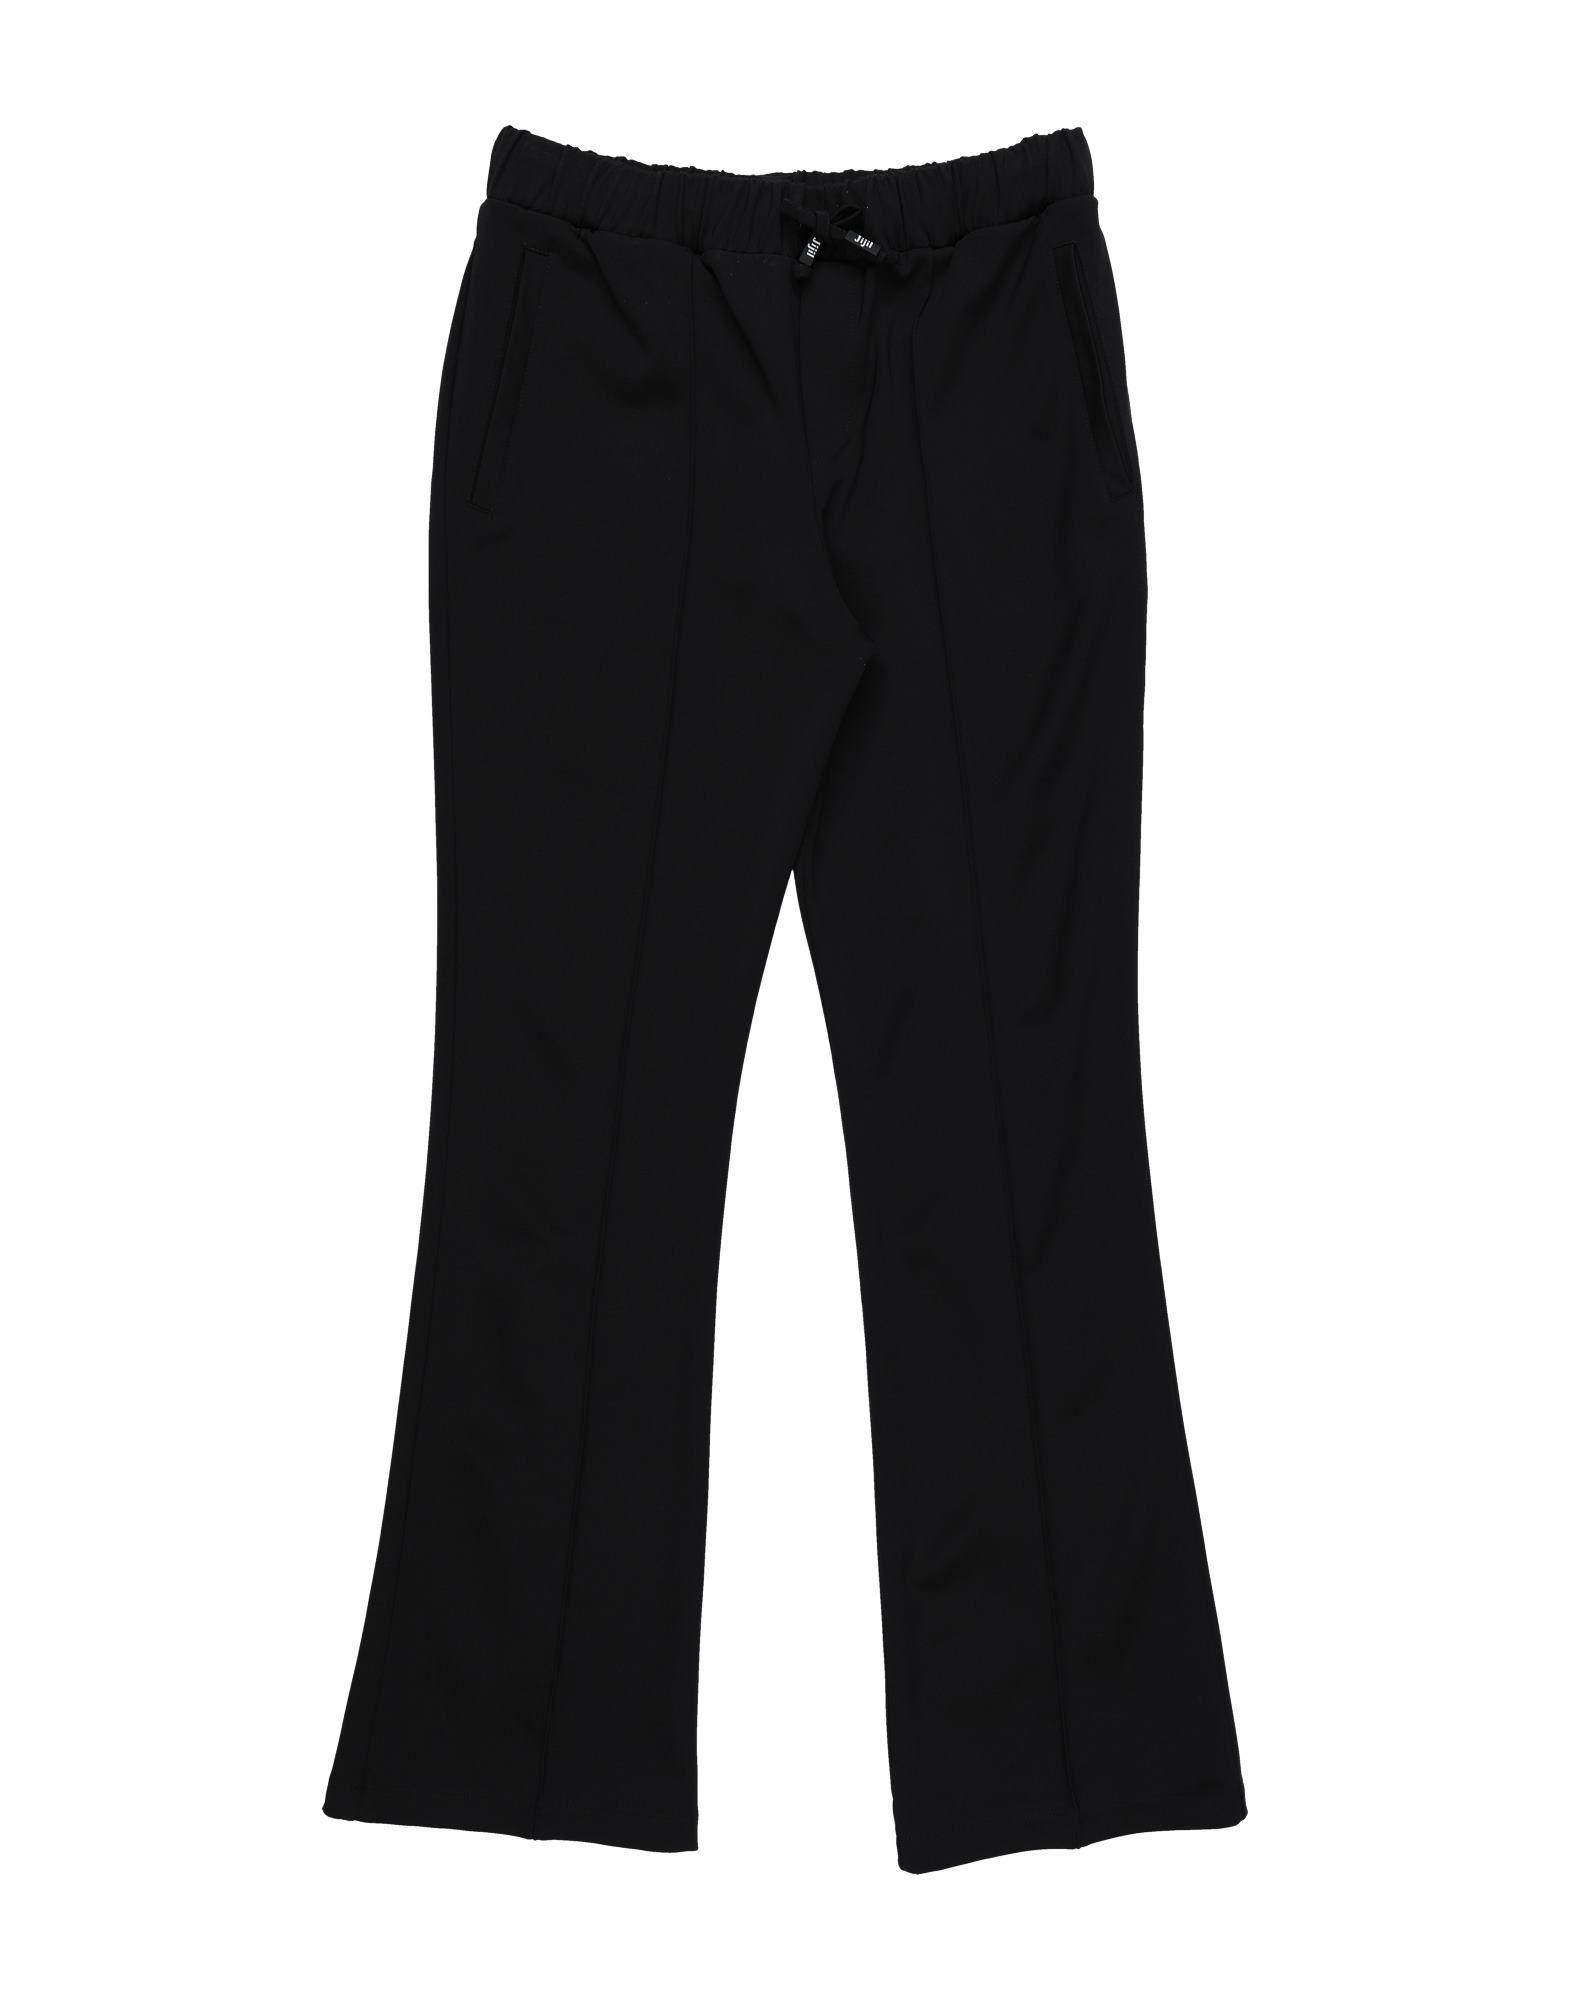 Jijil Jolie Kids' Casual Pants In Black